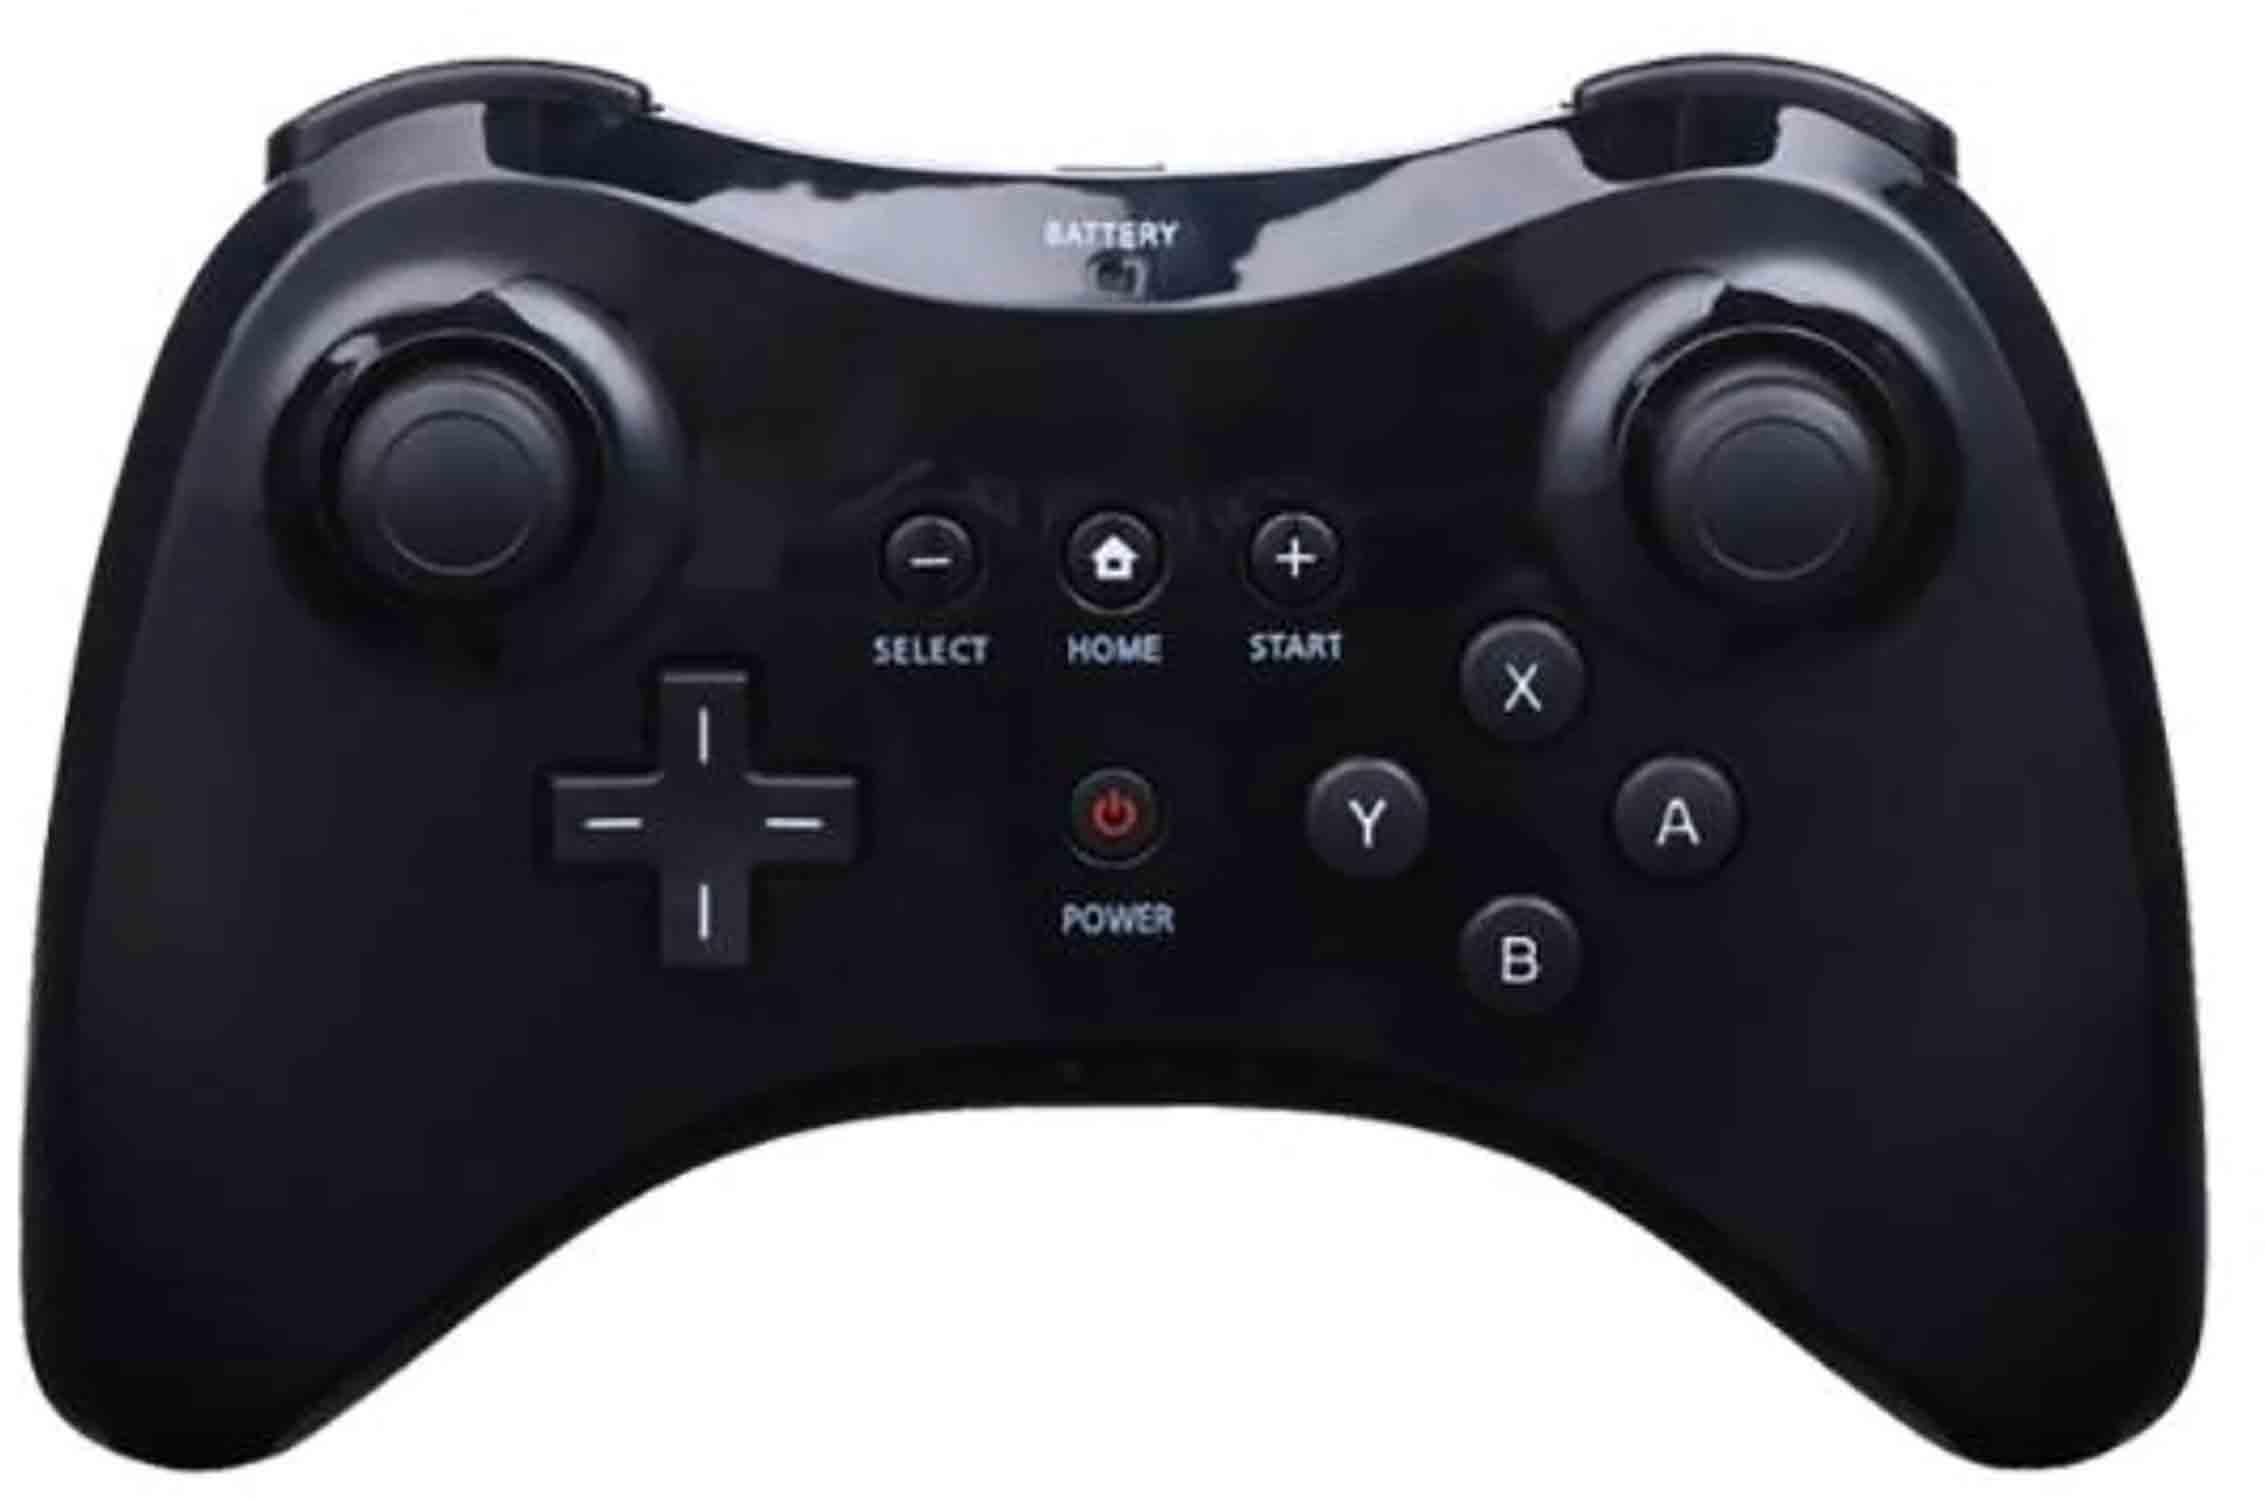 Ovladač Wii U Pro Controller gamepad - černý